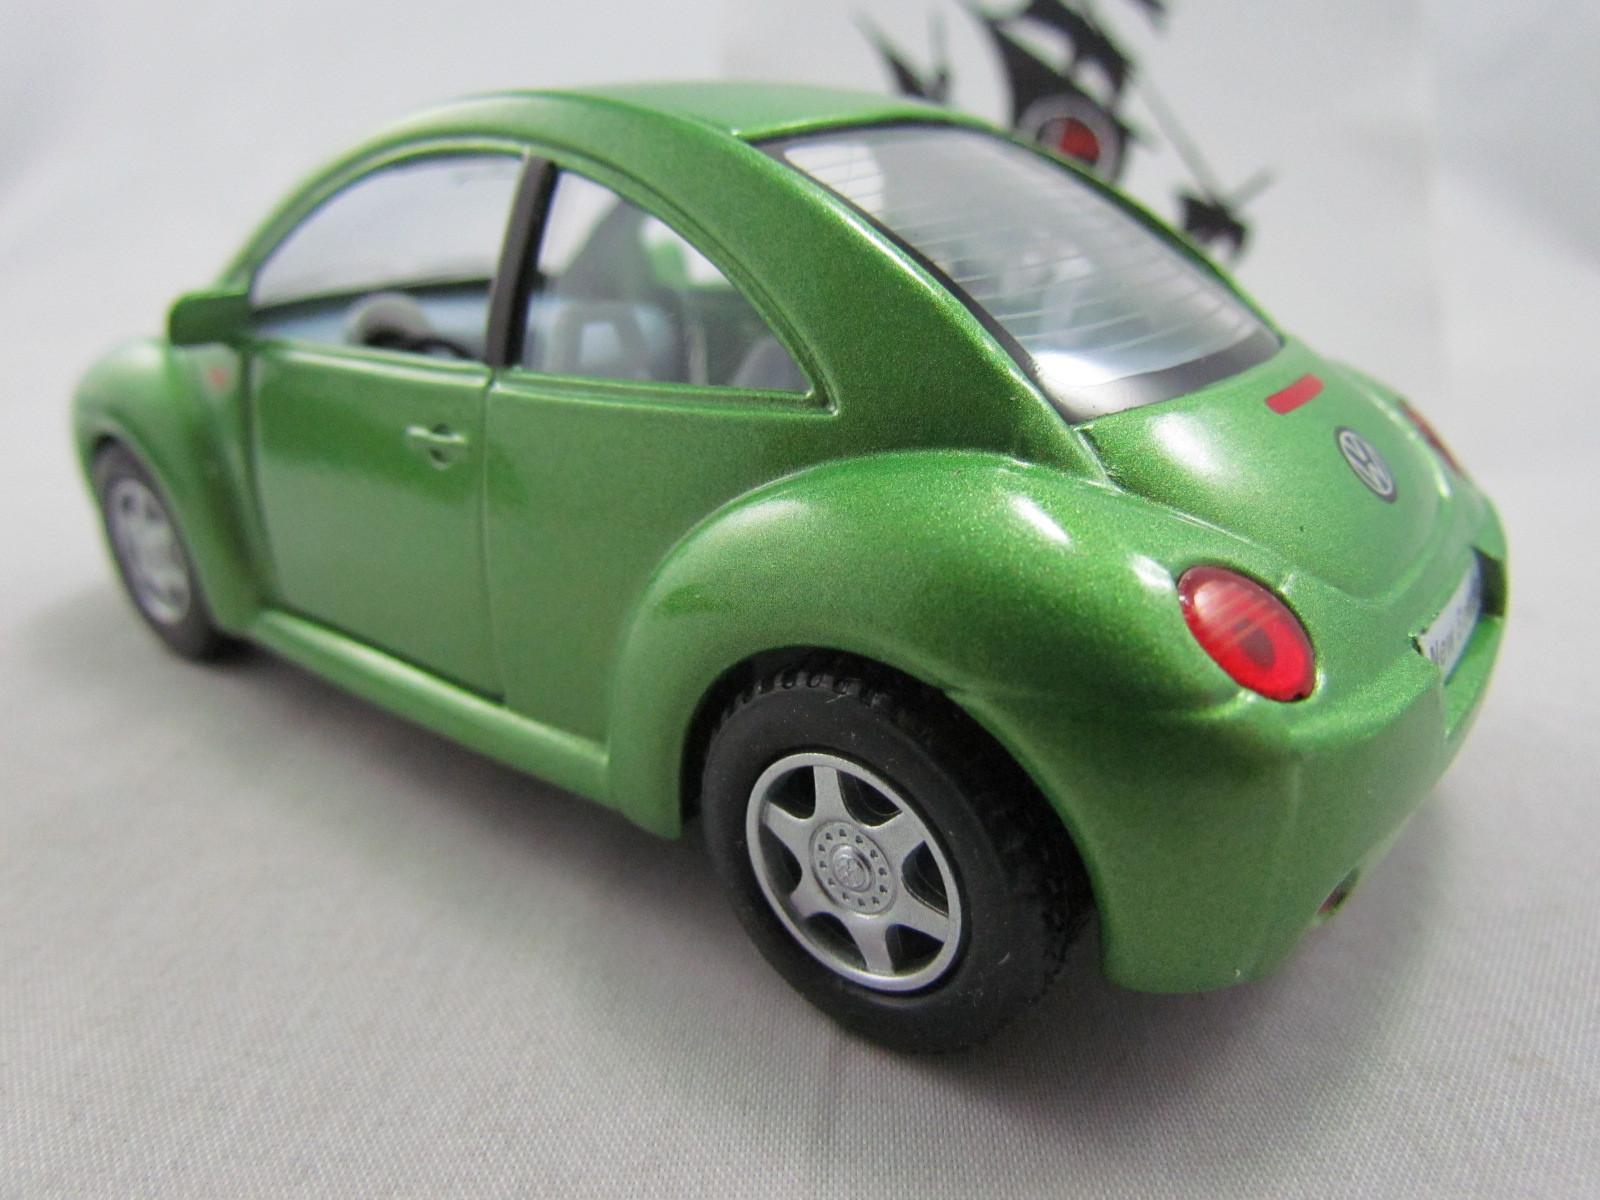 VW New Beetle Verde Kinsmart 1:32